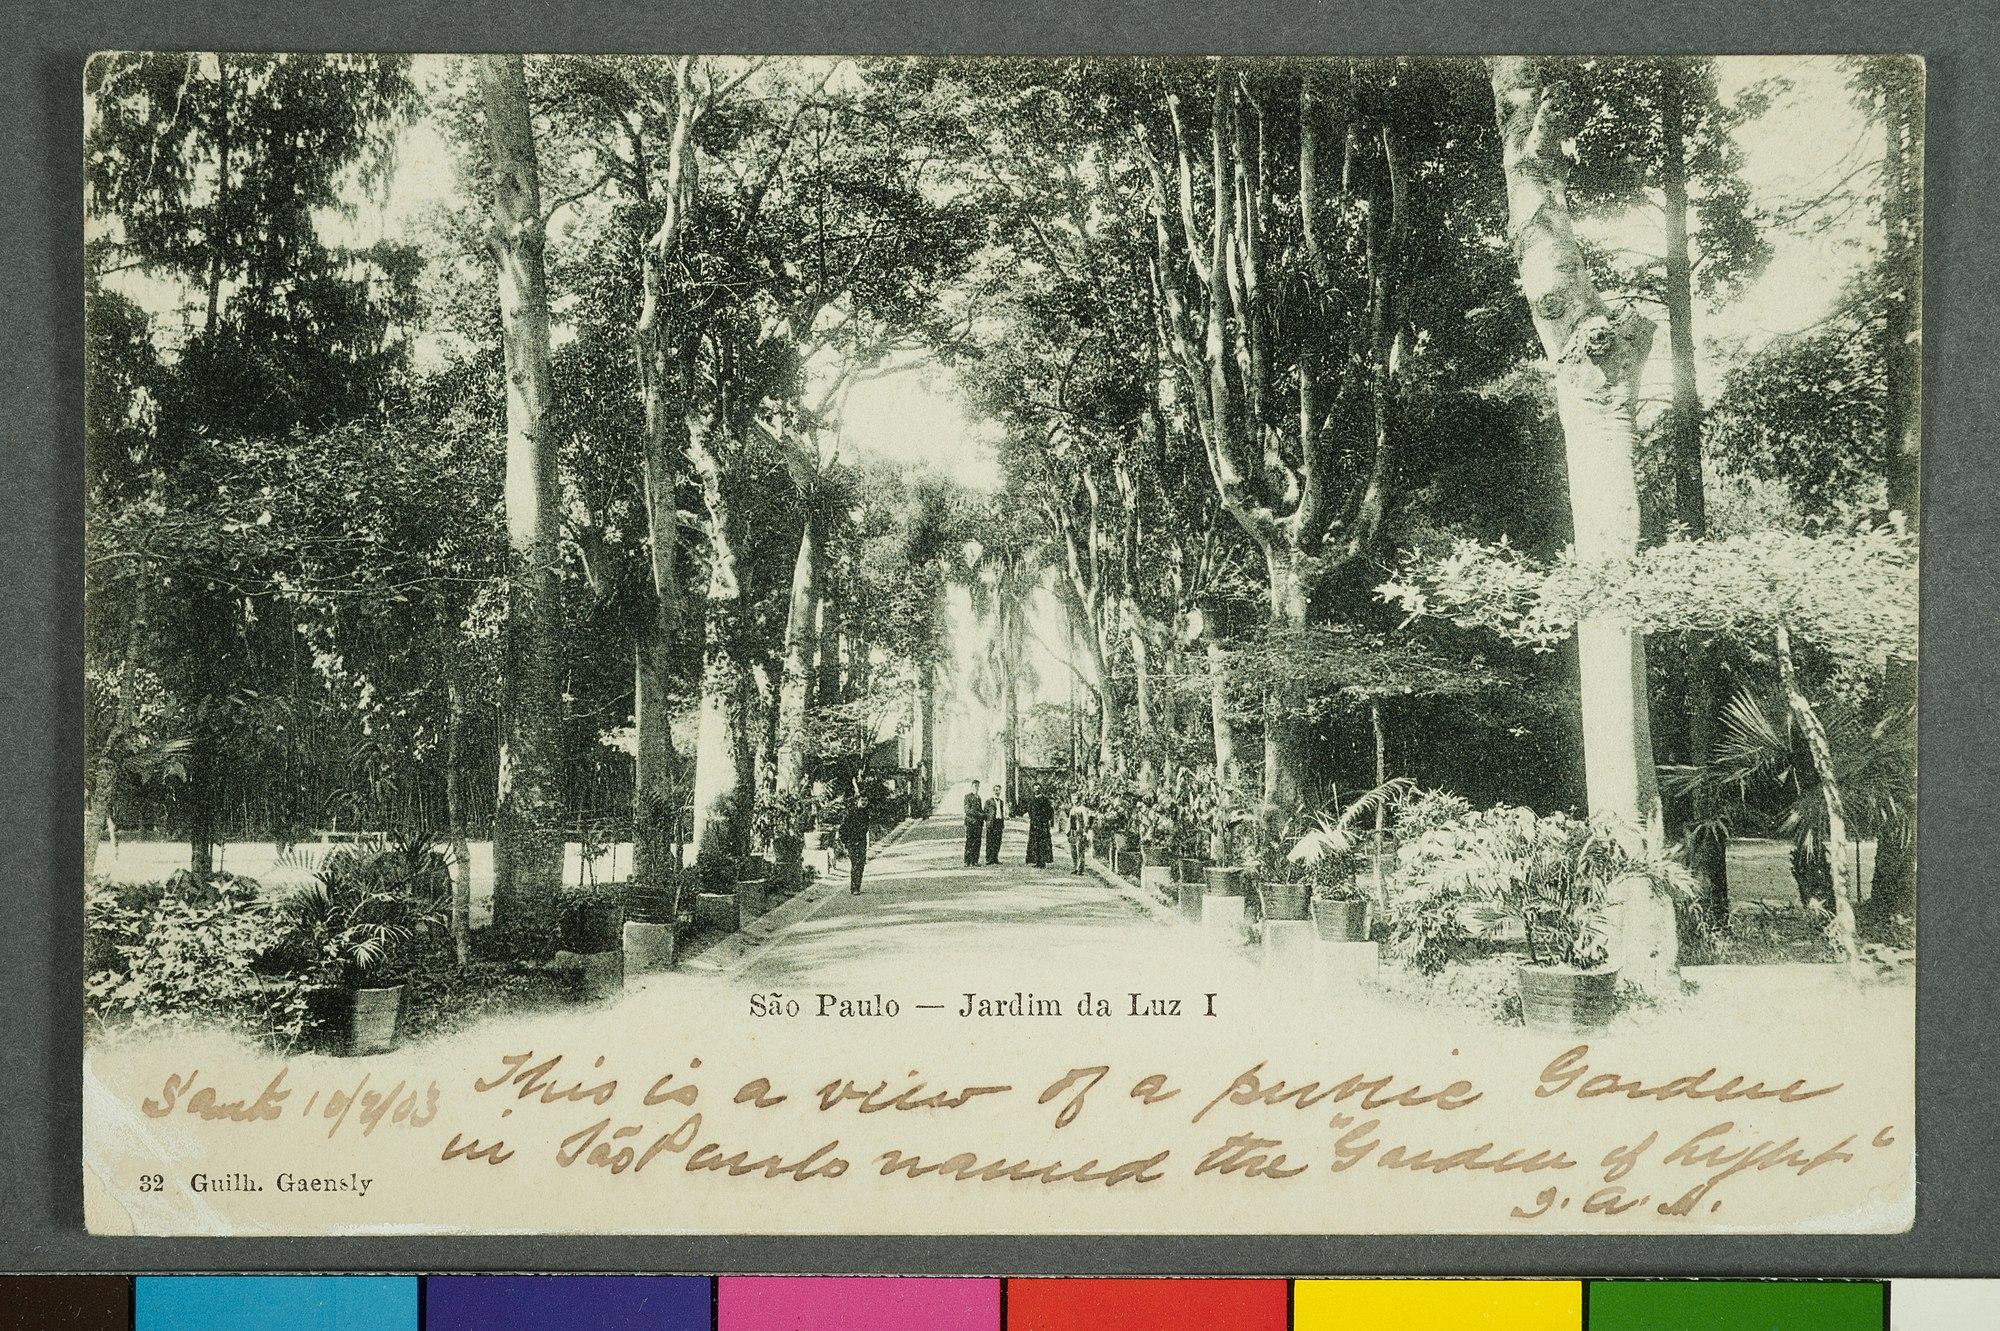 São Paulo - Jardim da Luz I